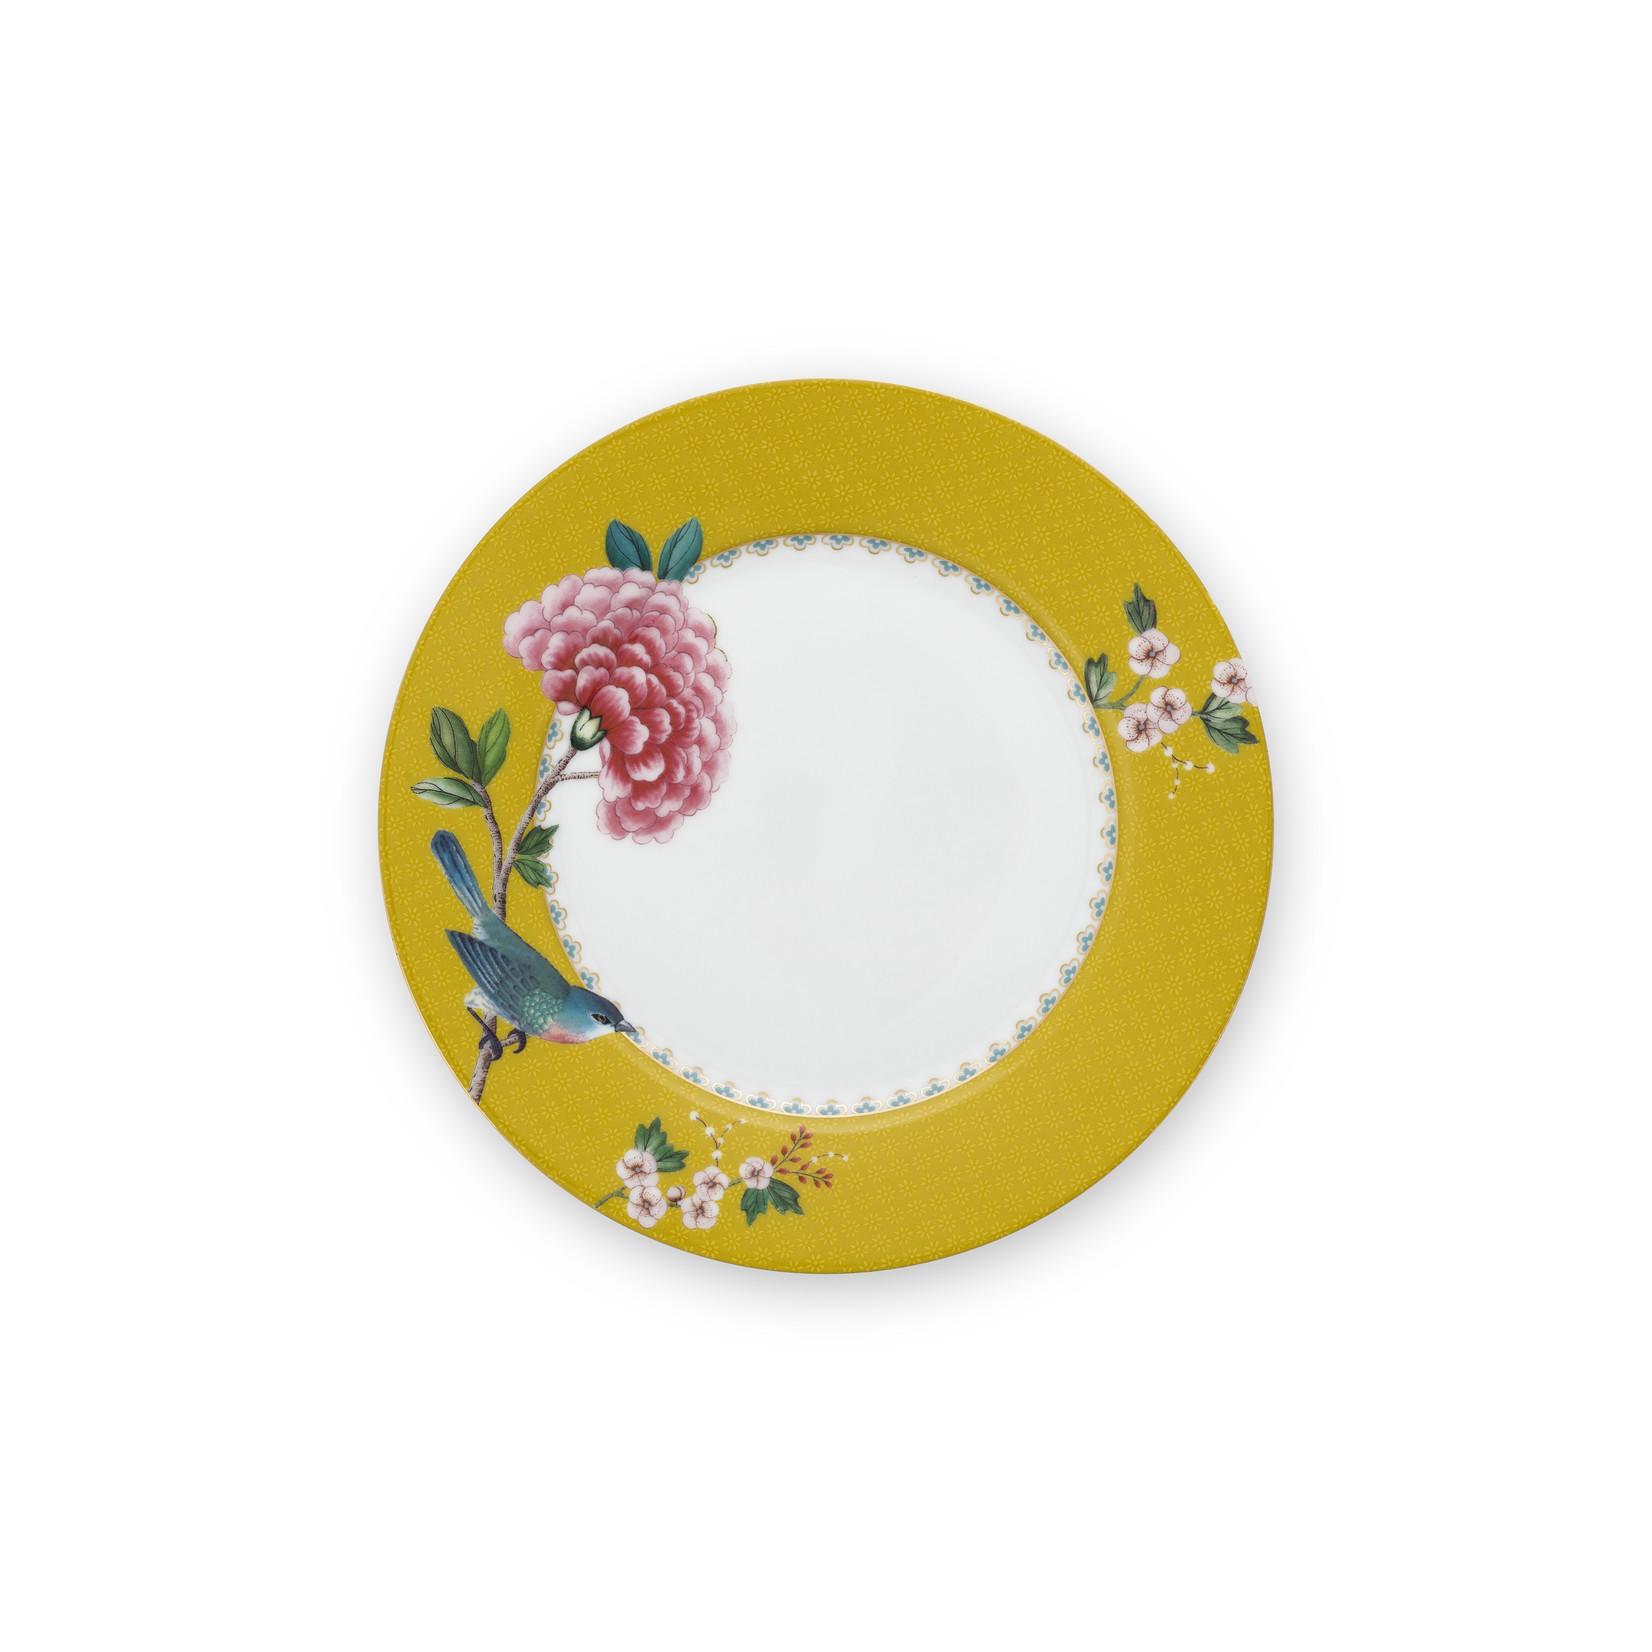 PIP Studio Plate / Ontbijtbord Blushing Birds Yellow 21cm